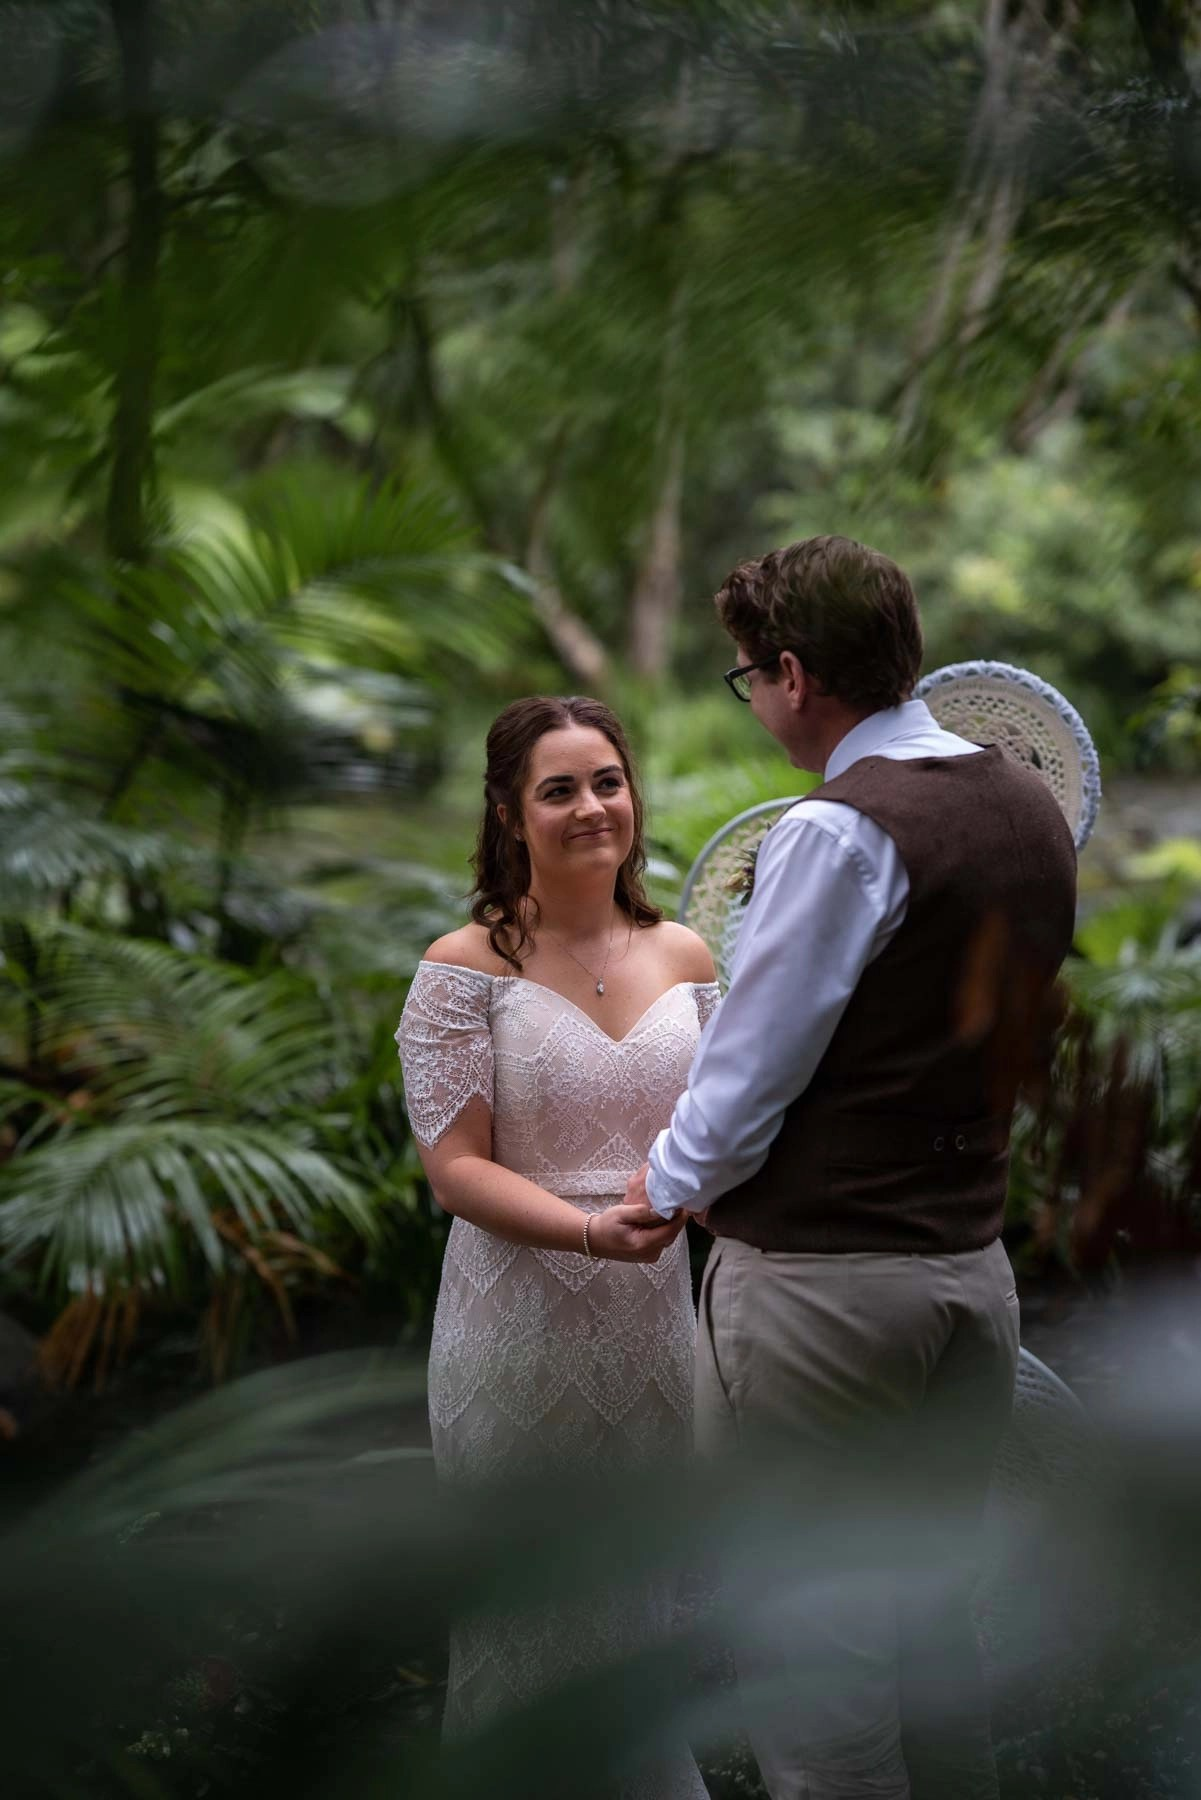 Bridal portrait at alter in rainforest elopement